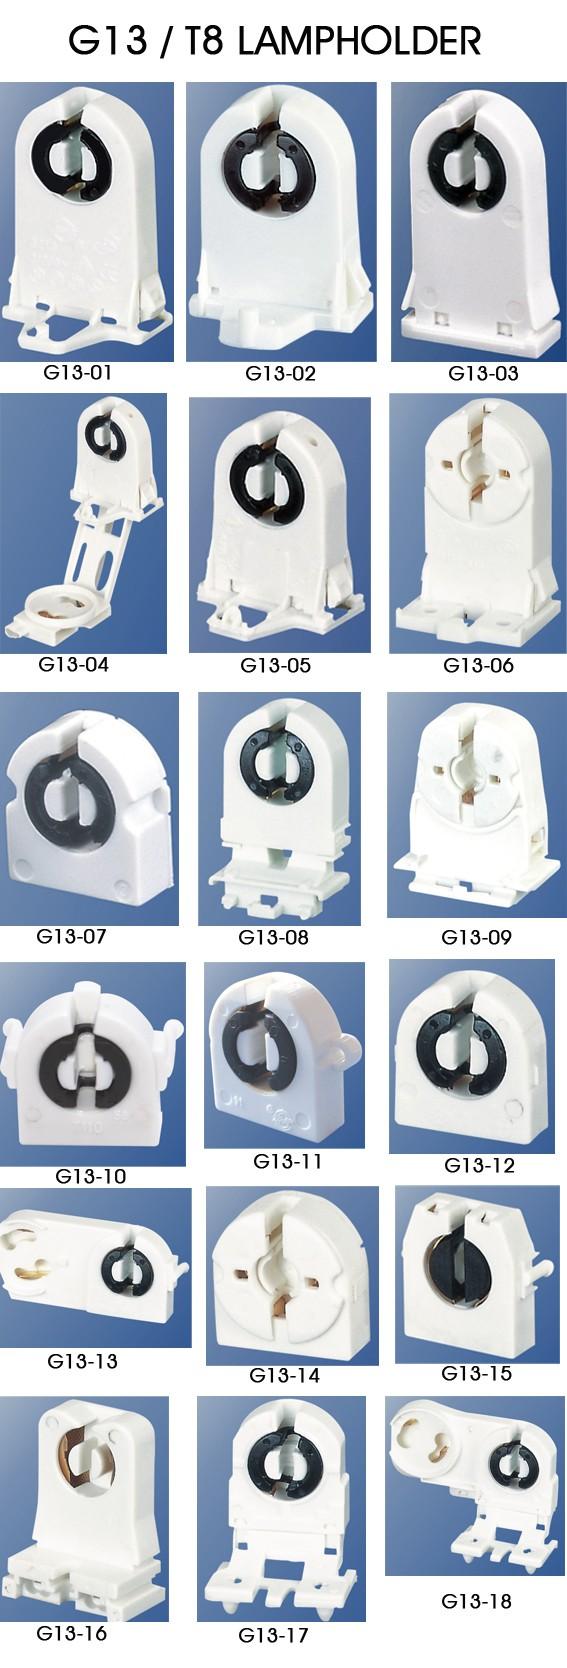 G13 non shunted socket ul listed t8 t10 tube light lamp holder g13 non shunted socket ul listed t8 t10 tube light lamp holder tombstone fixture holder arubaitofo Images